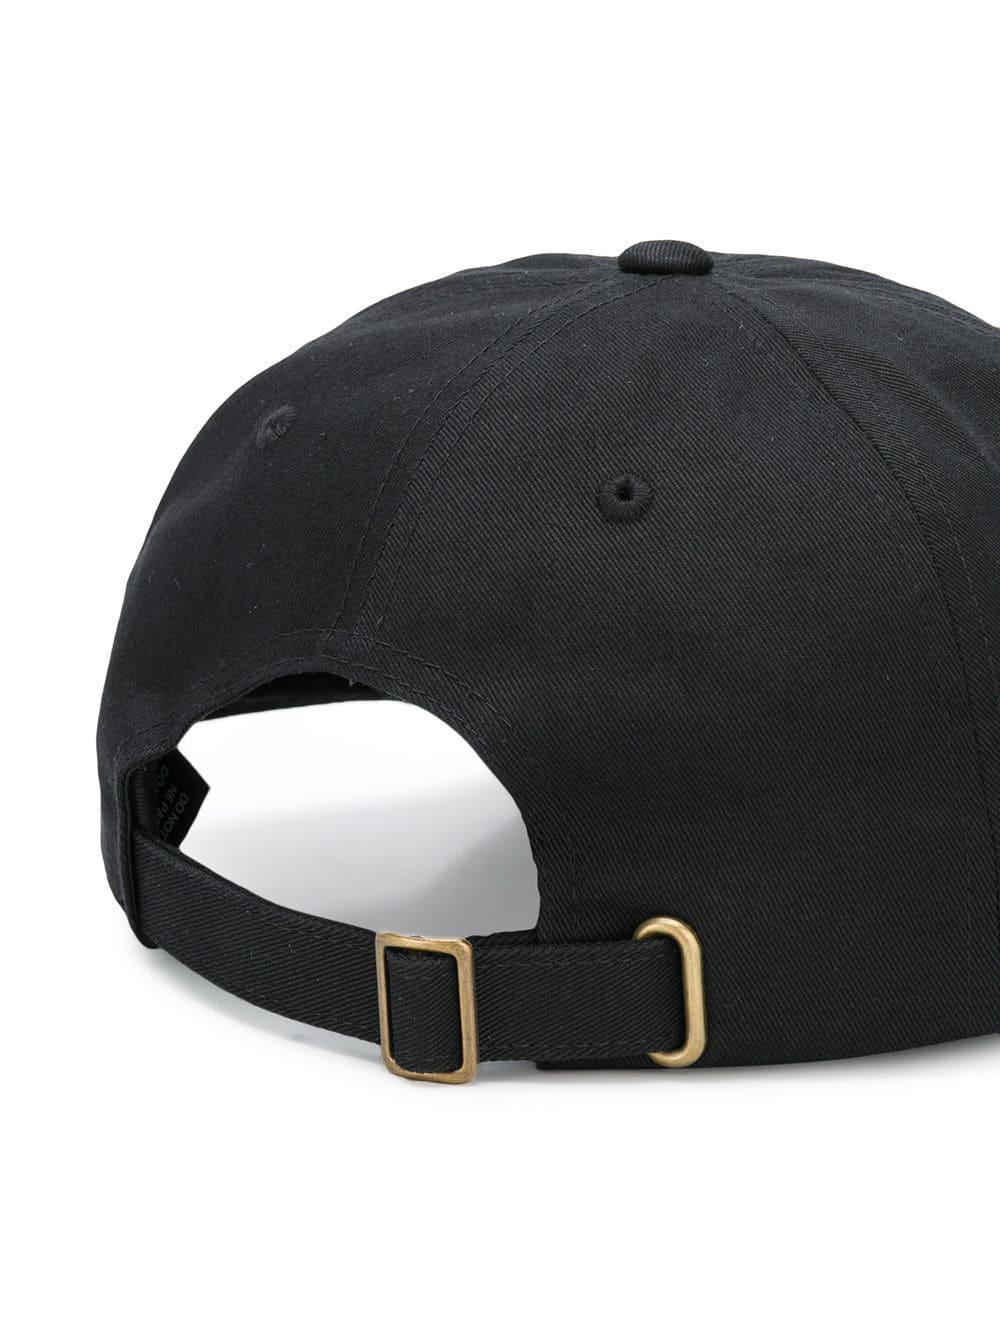 Lyst - Gorra con logo Stussy de hombre de color Negro ... 7ac89fa9850